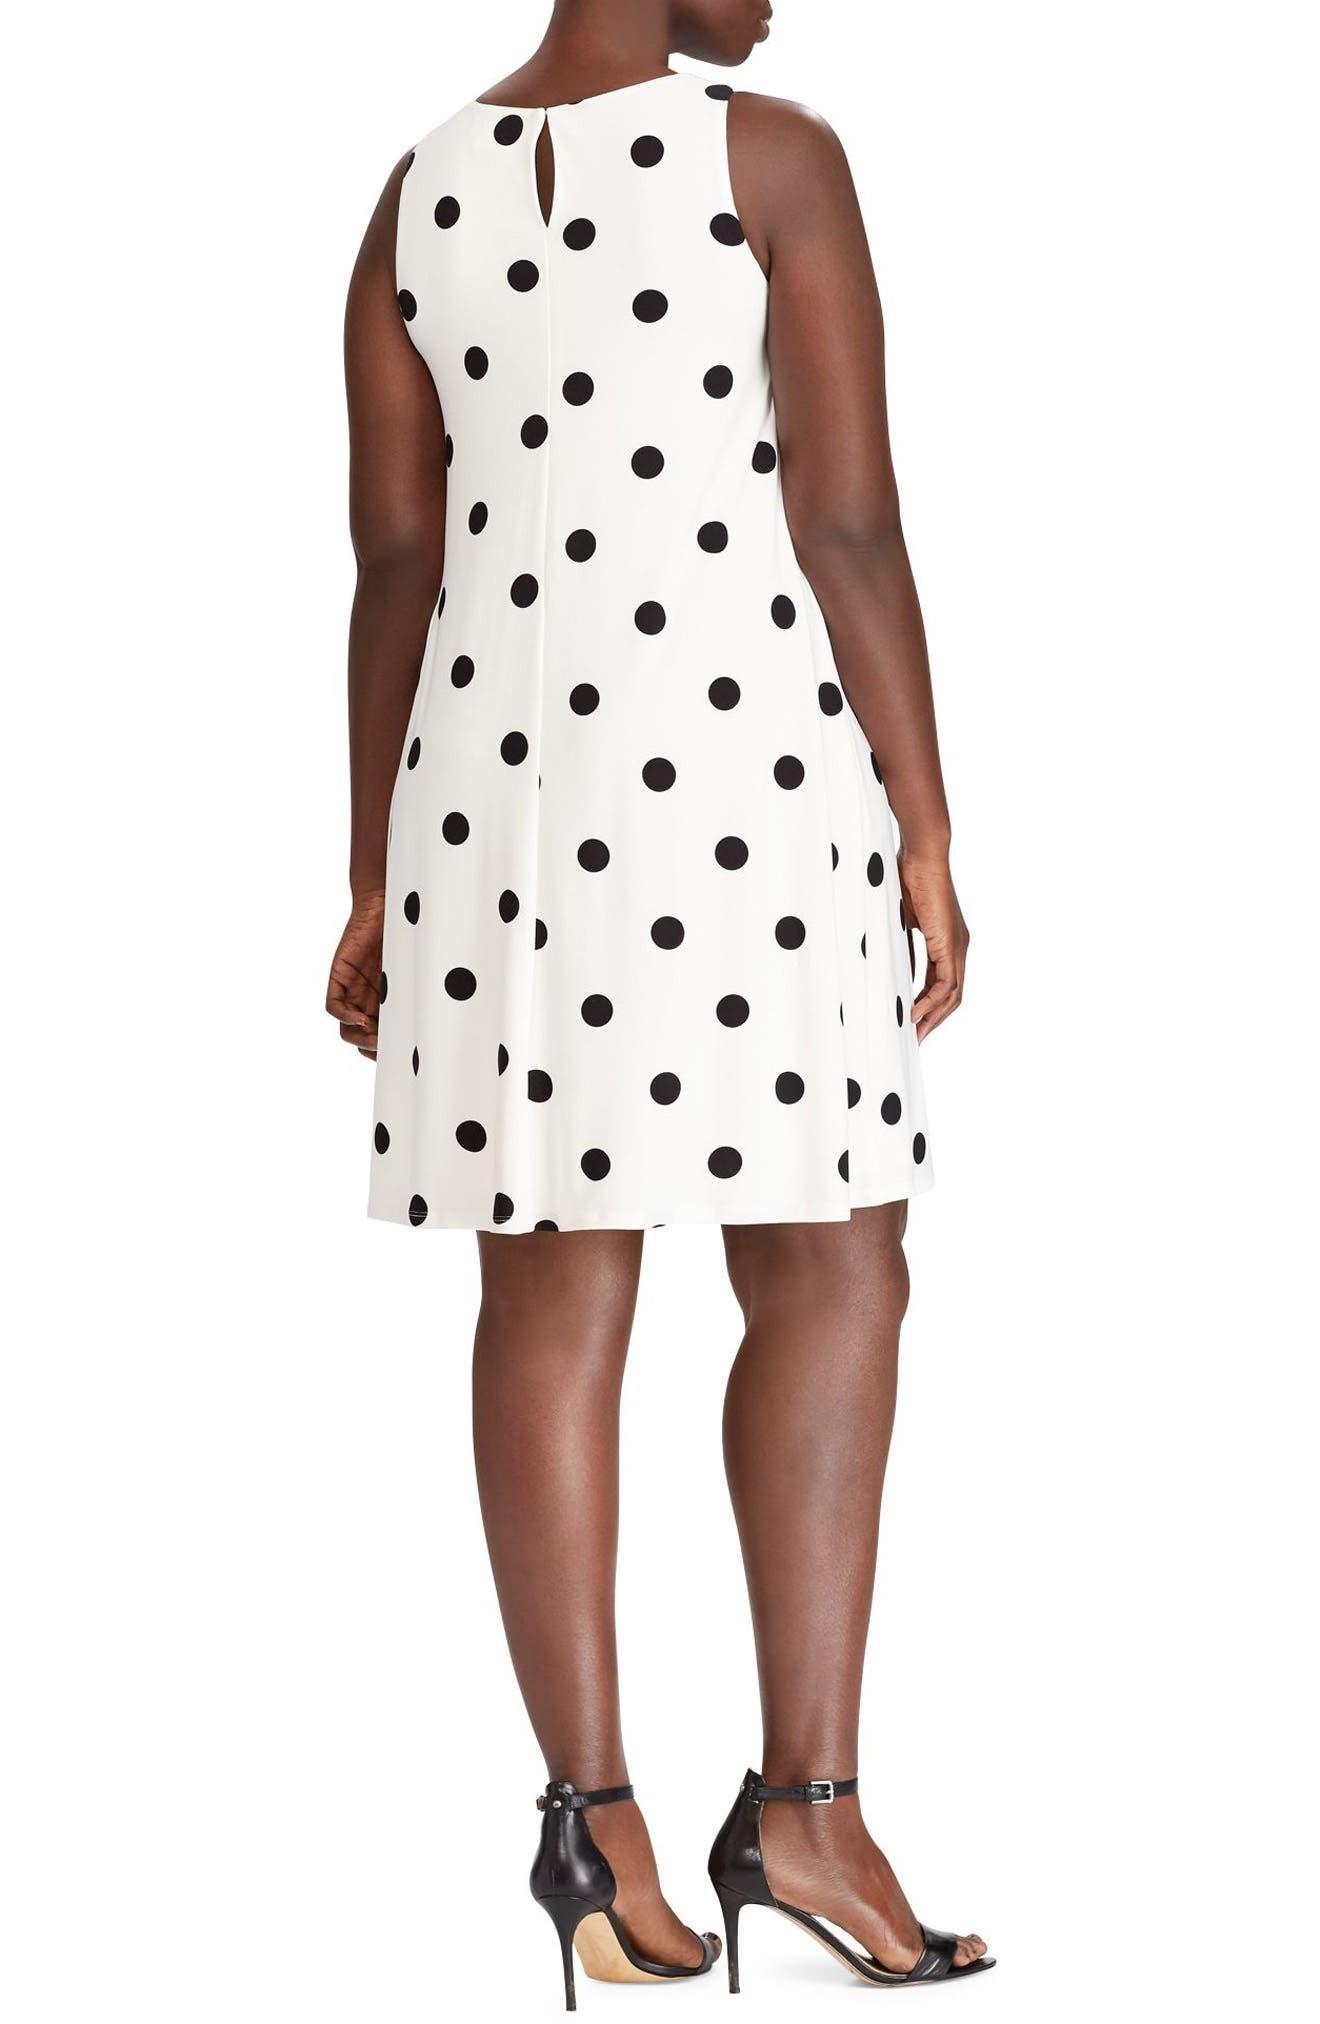 Peninsula Dot A-Line Dress,                             Alternate thumbnail 2, color,                             101